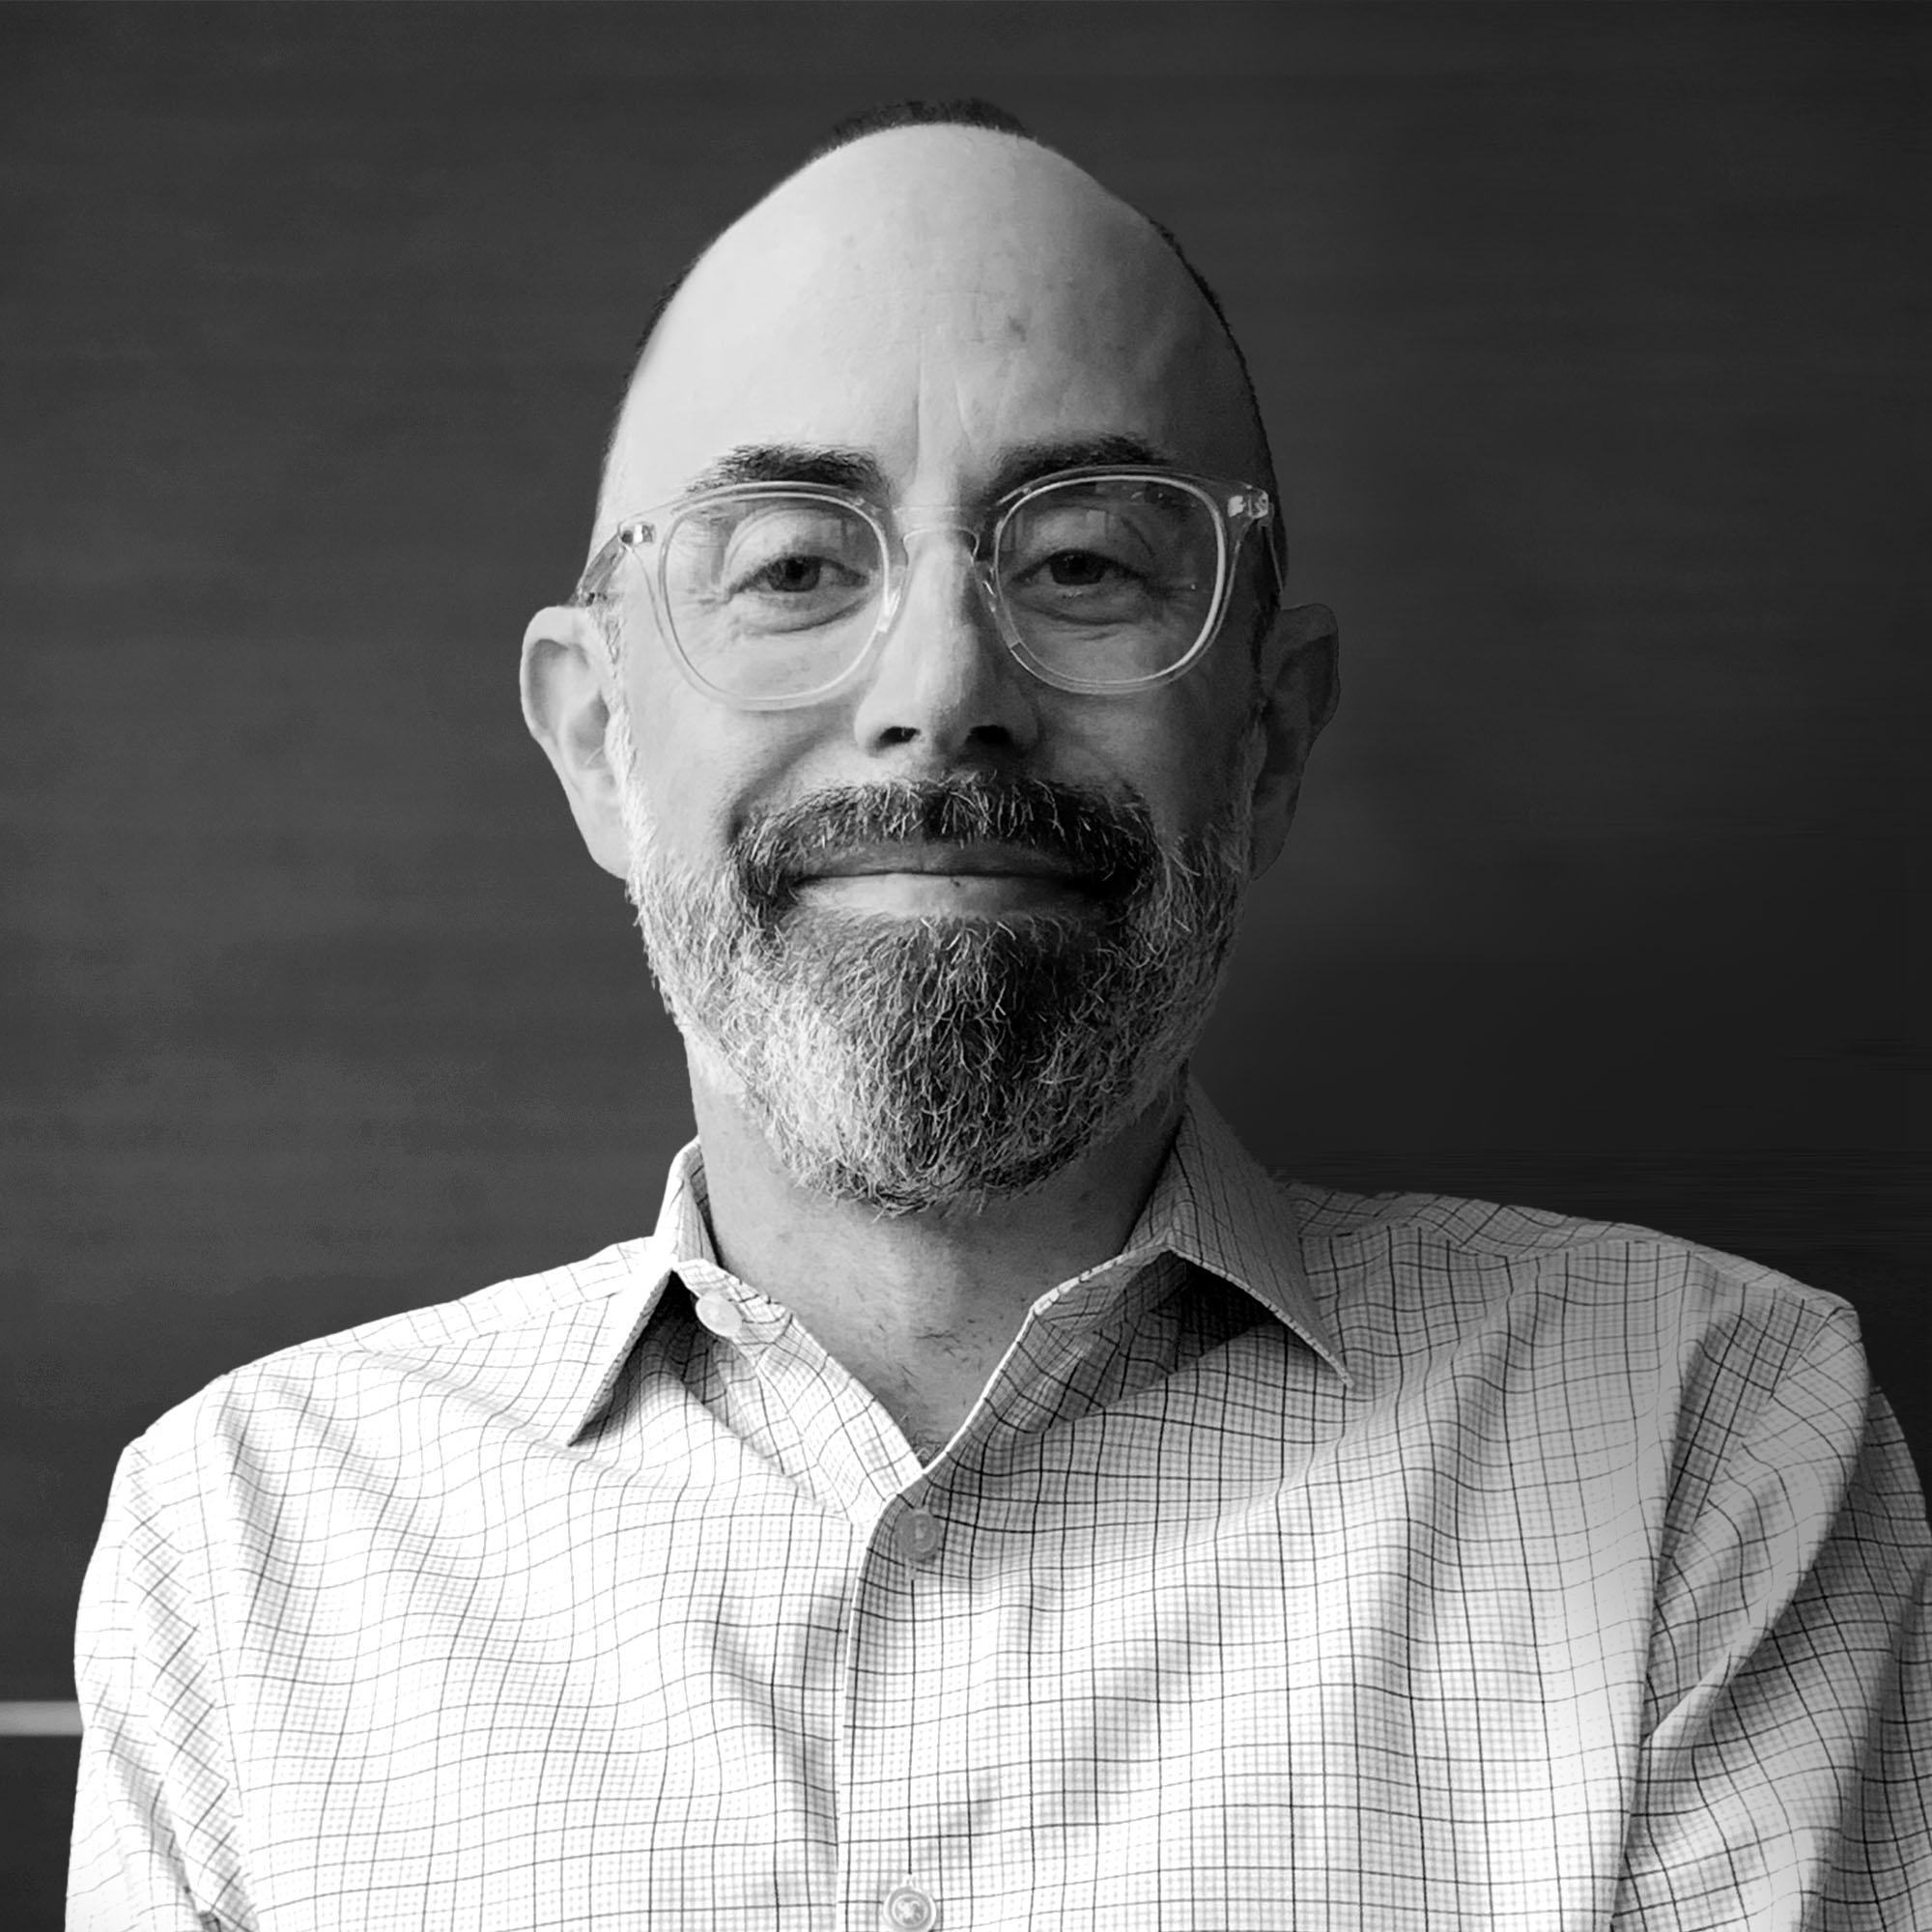 John Oren - Senior Director of Web Analytics